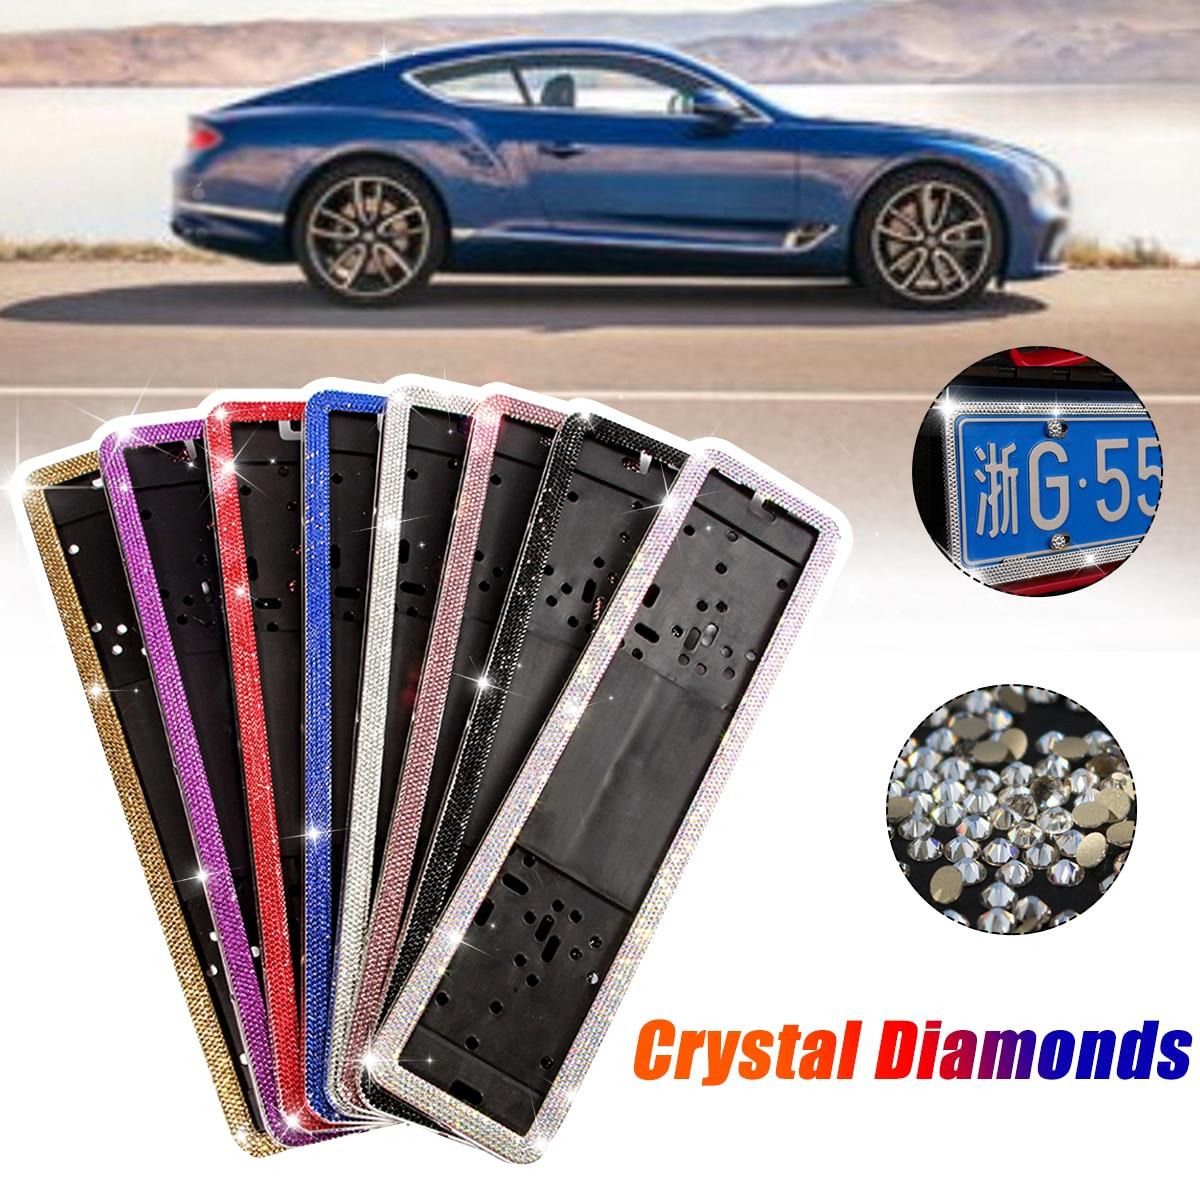 1 Juego de diamantes de cristal de acero inoxidable Marco de matrícula de coche europeo alemán ruso soporte para marco de placa de matrícula